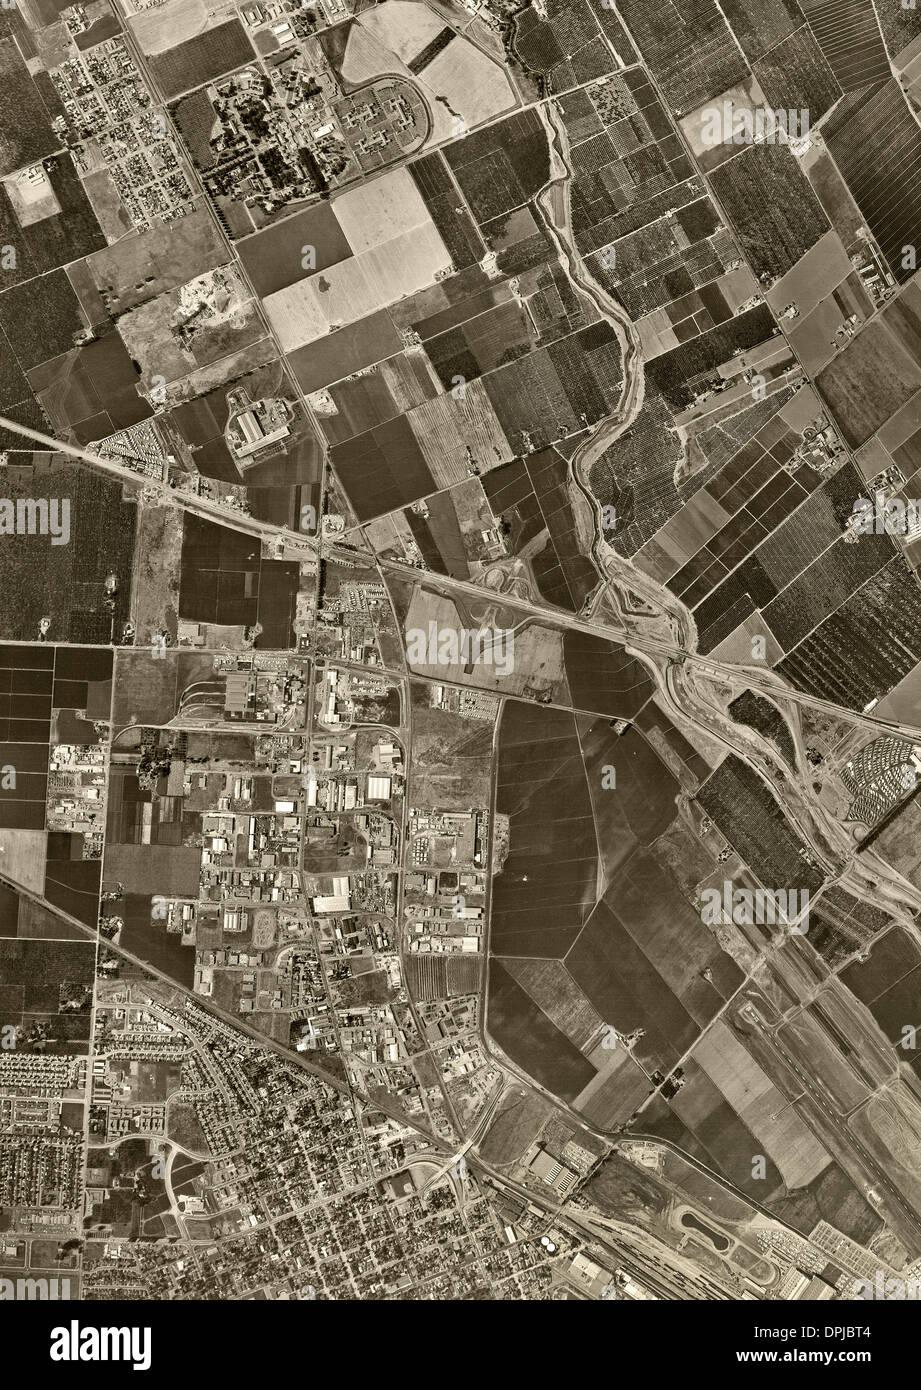 historical aerial photograph Santa Clara, California, 1960 - Stock Image